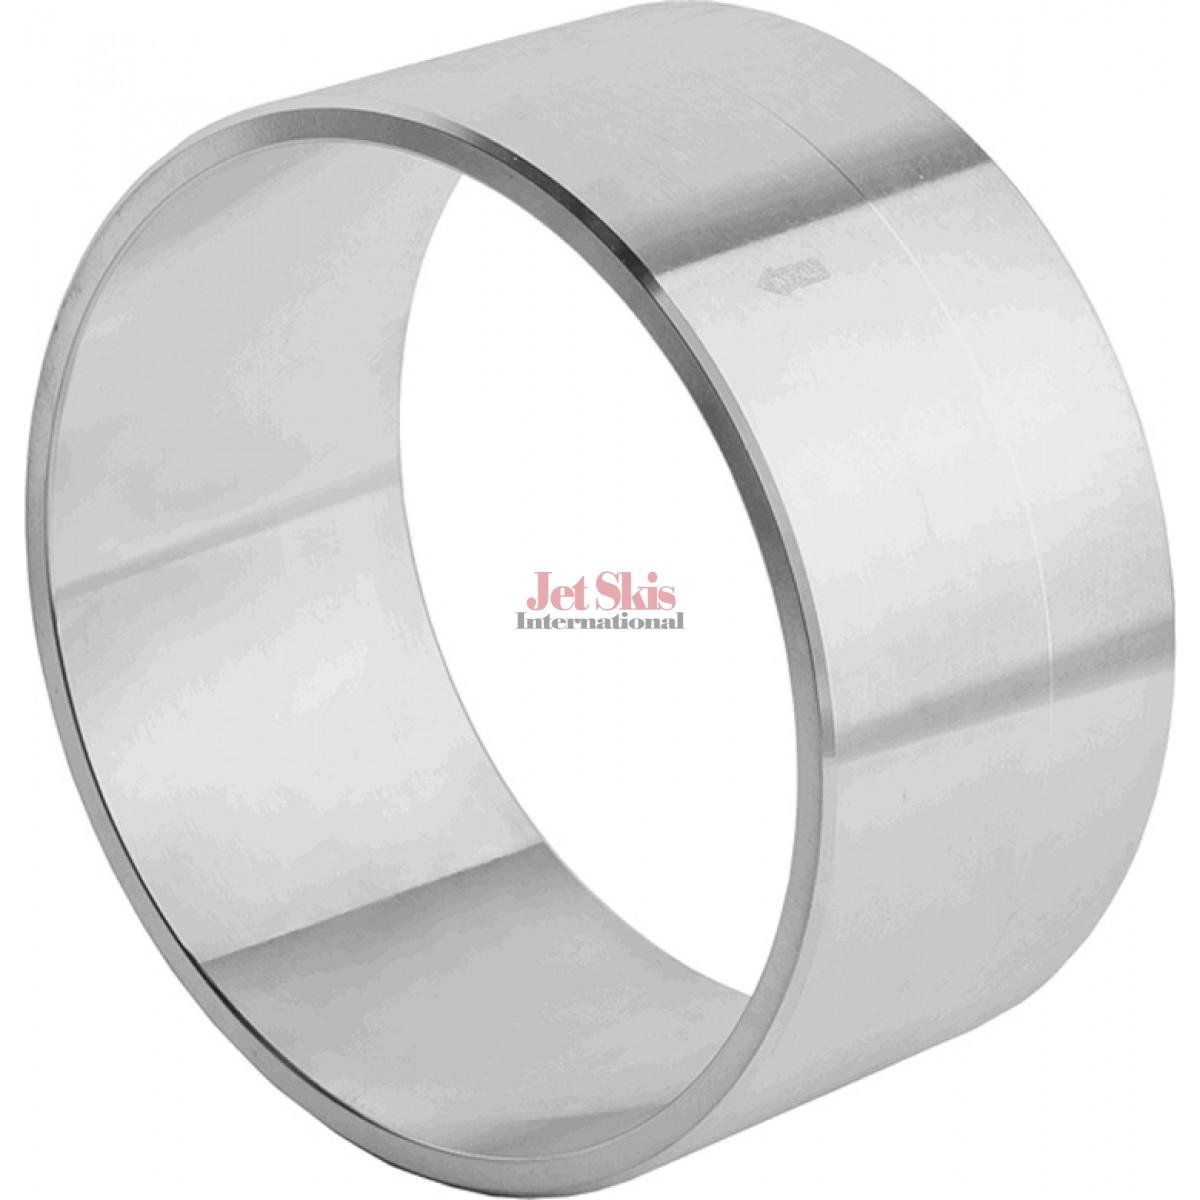 SEADOO WEAR RING SRX-HS-159-002 SOLAS FOR RXP/RXT-X/GTX